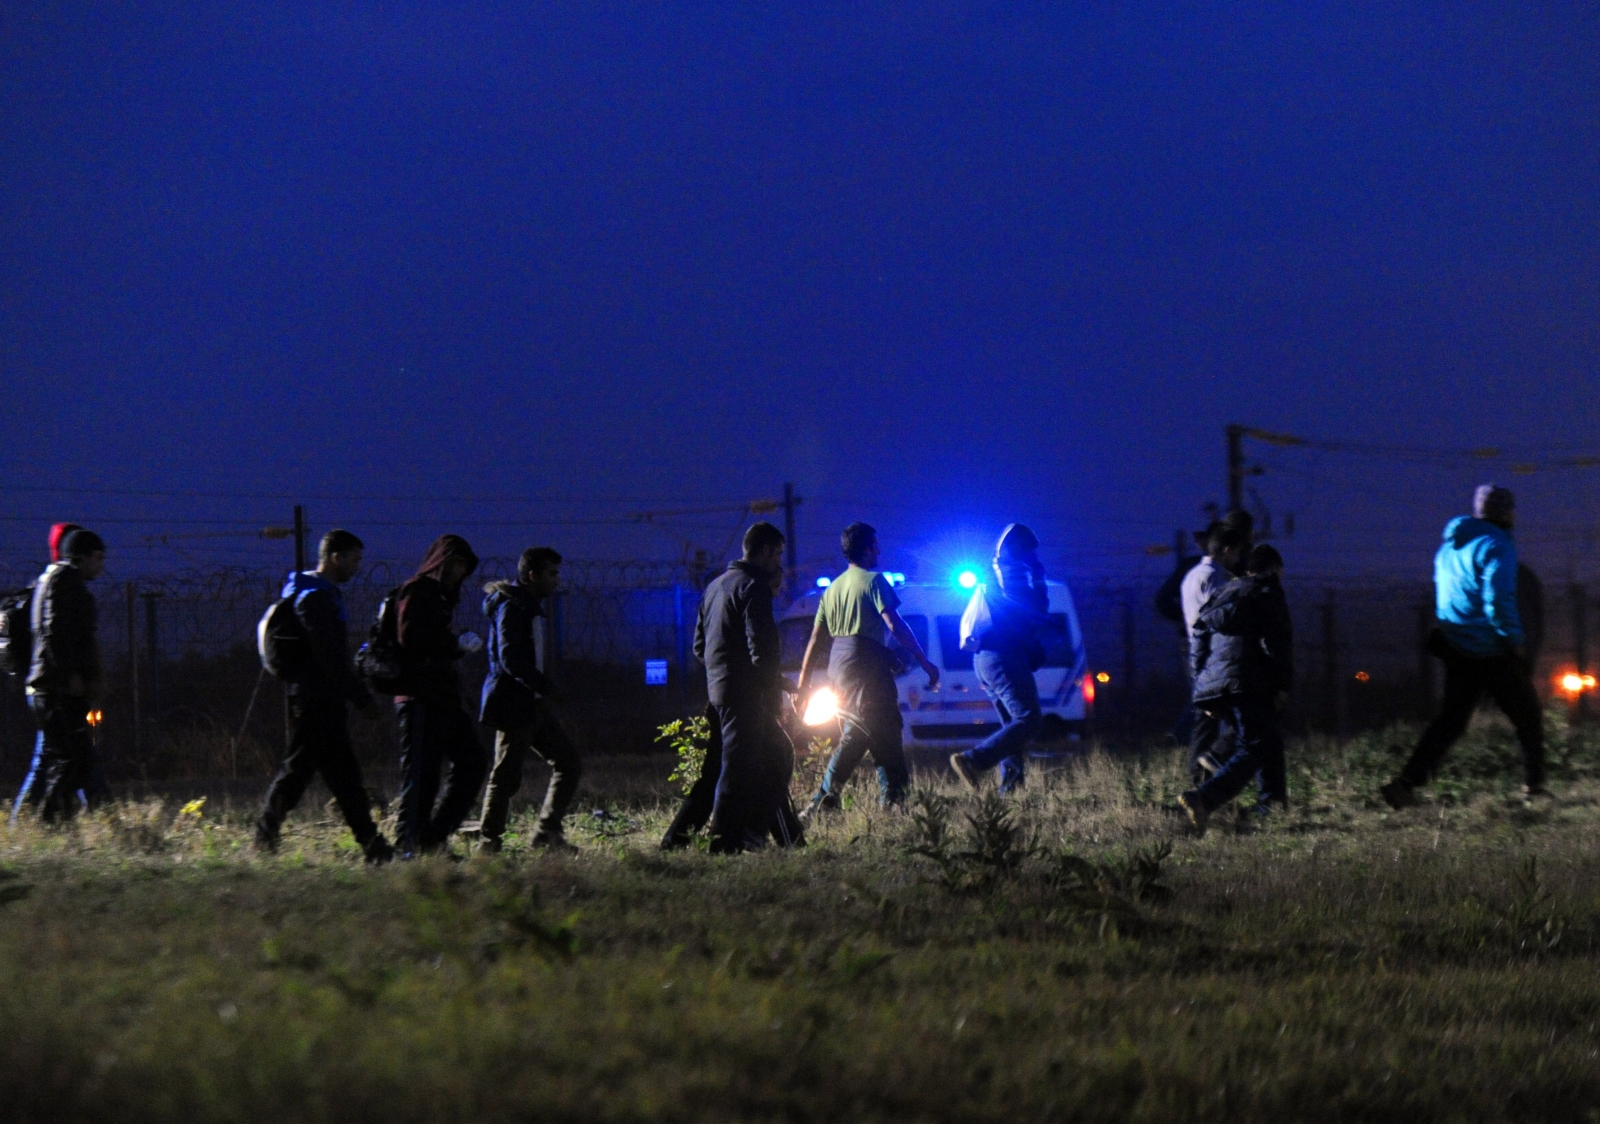 Migrants avoid the police